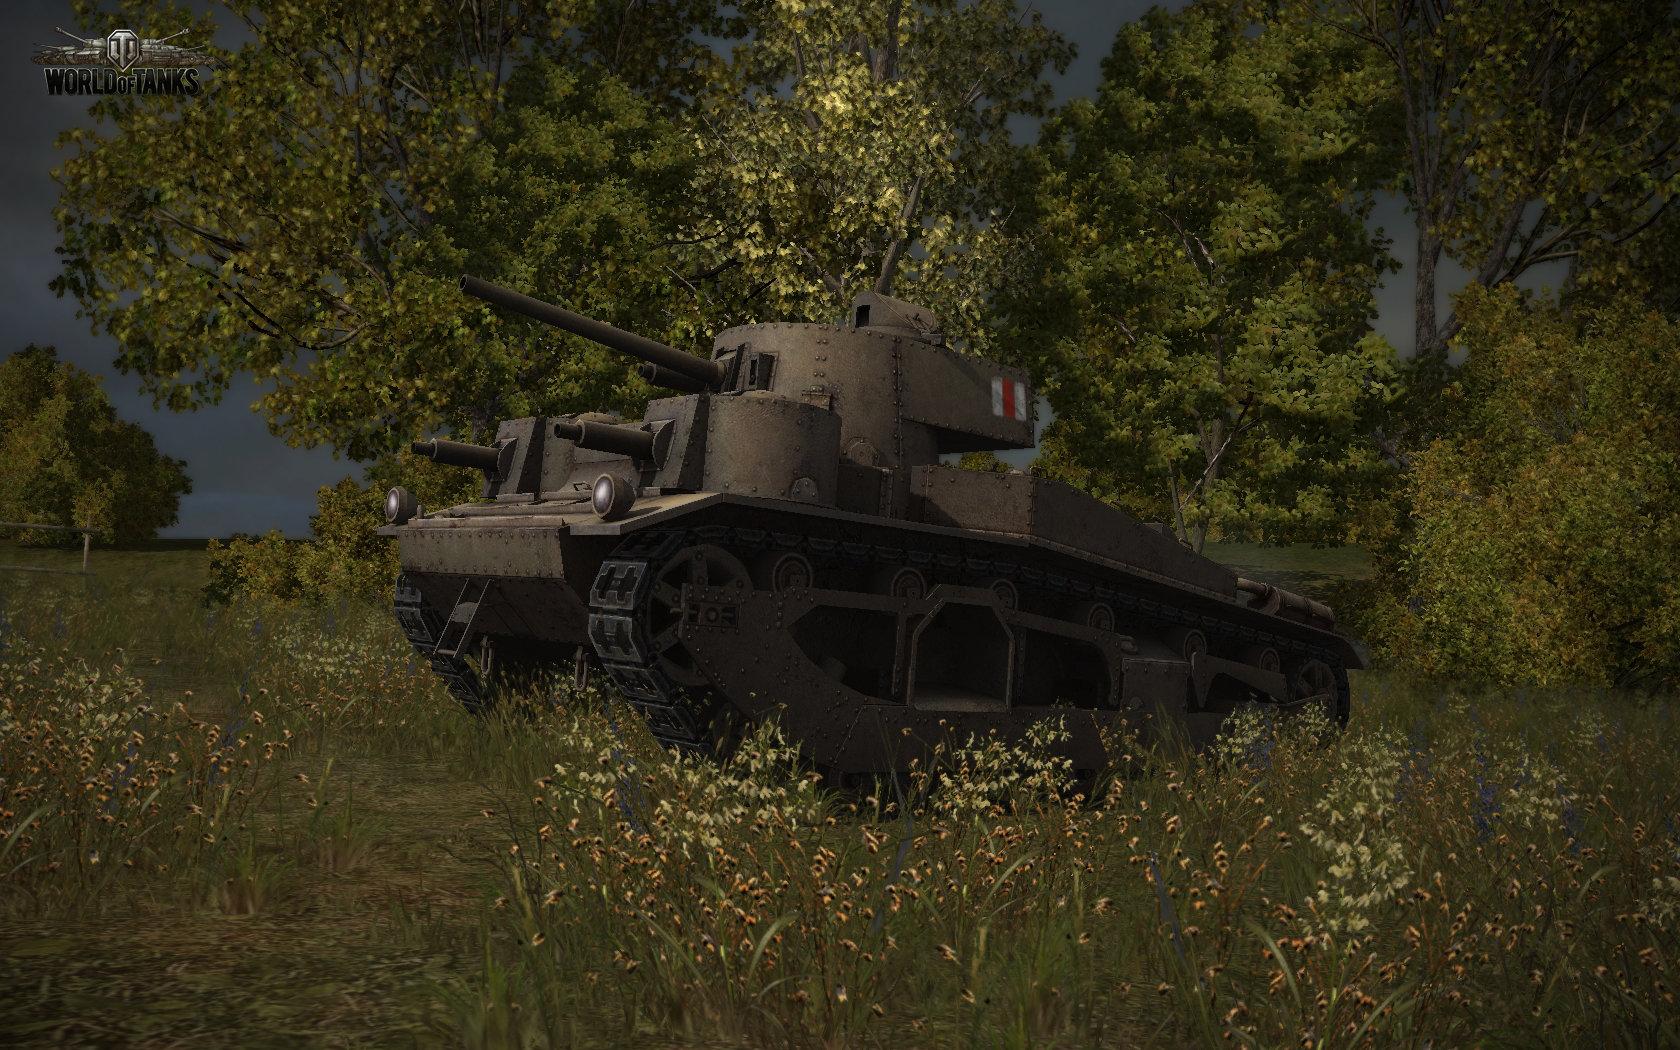 Vickers Medium Mark III